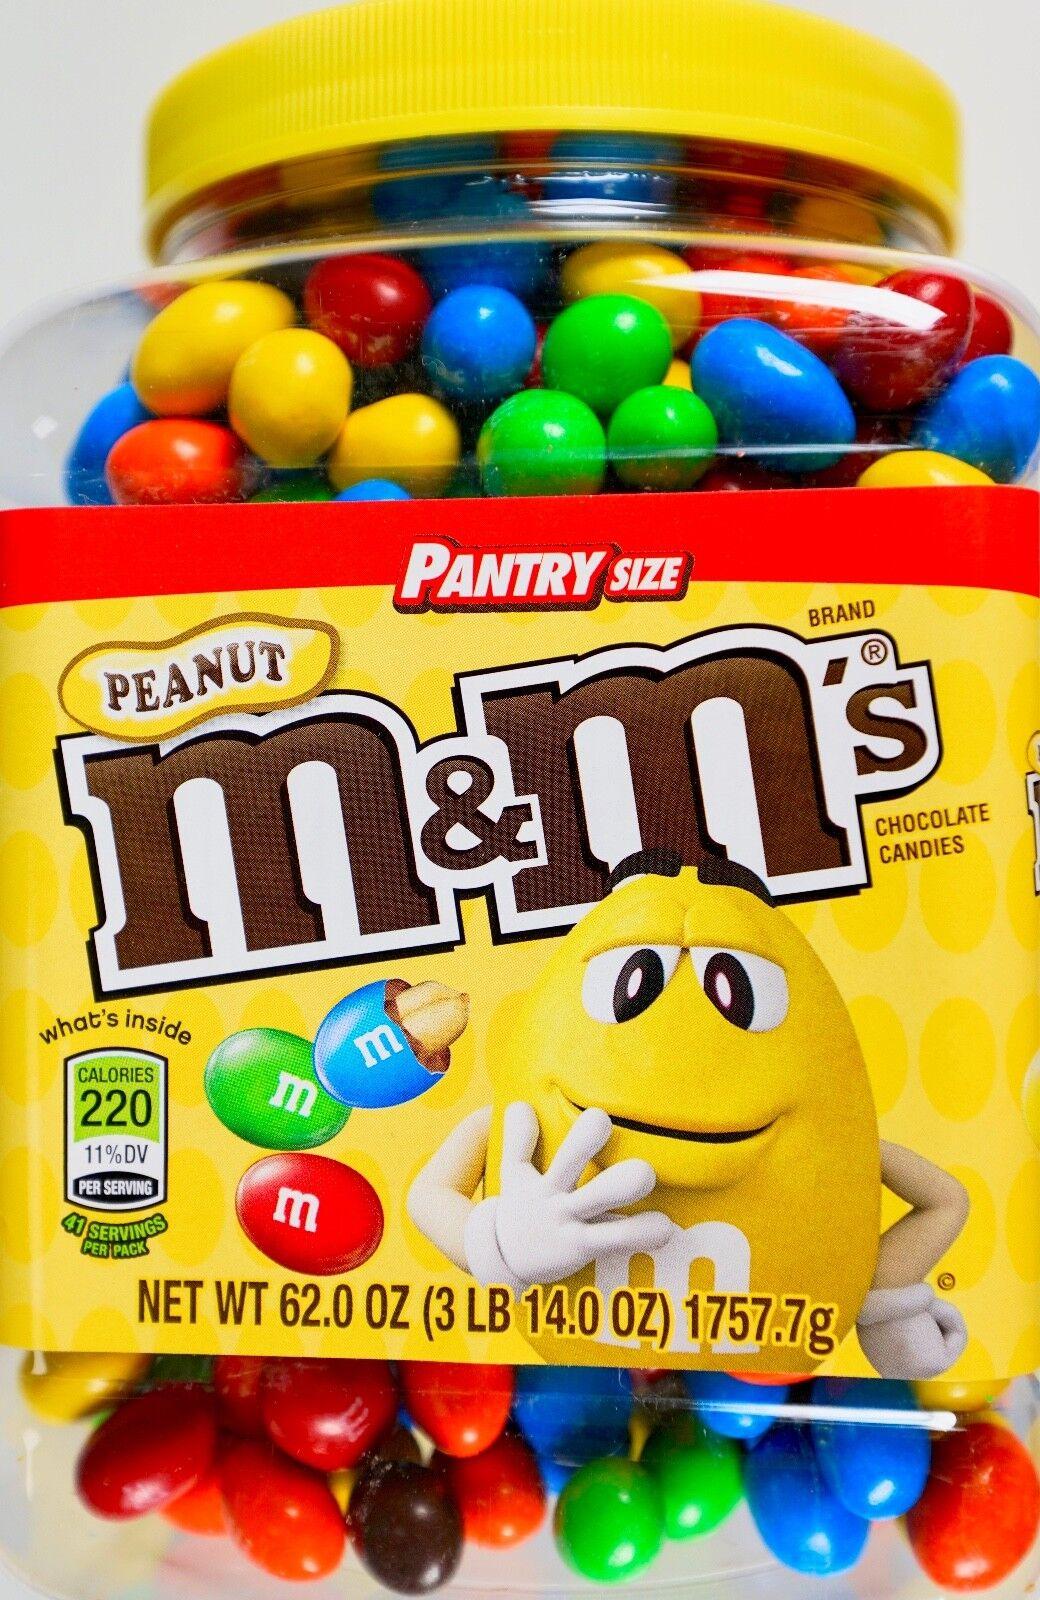 Mars M&M's Peanut Chocolate Candies Pantry-Size